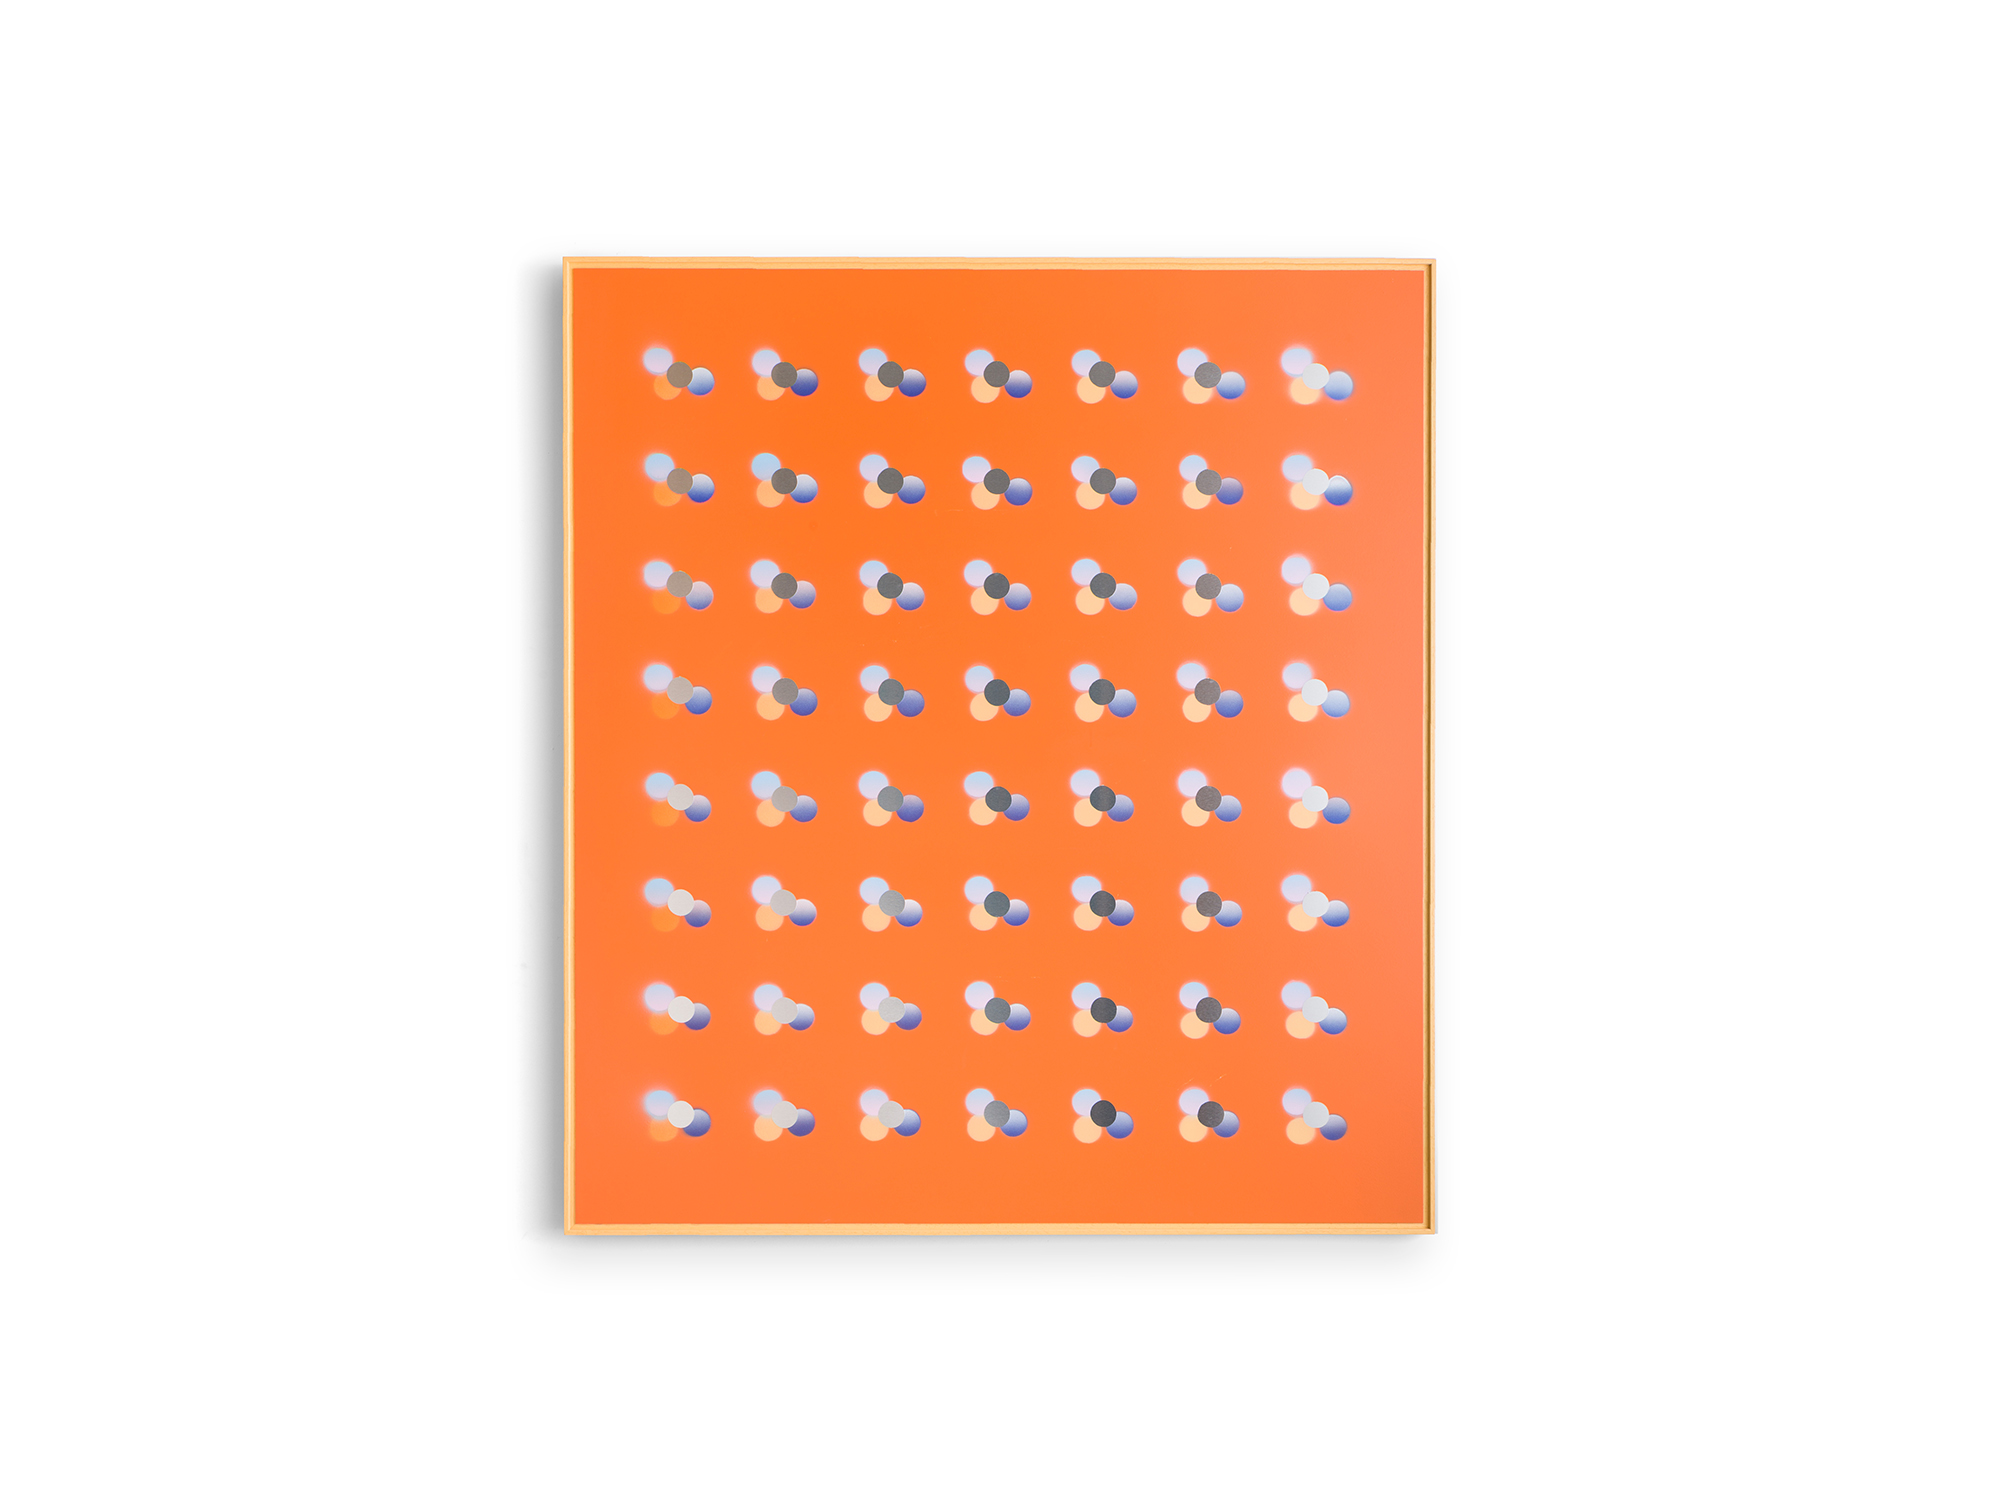 Will Cooke   True Romance , 2018 etch primer, gesso, acrylic on aluminium panel, artist's frame 92 x 82cm   ARTIST BIO